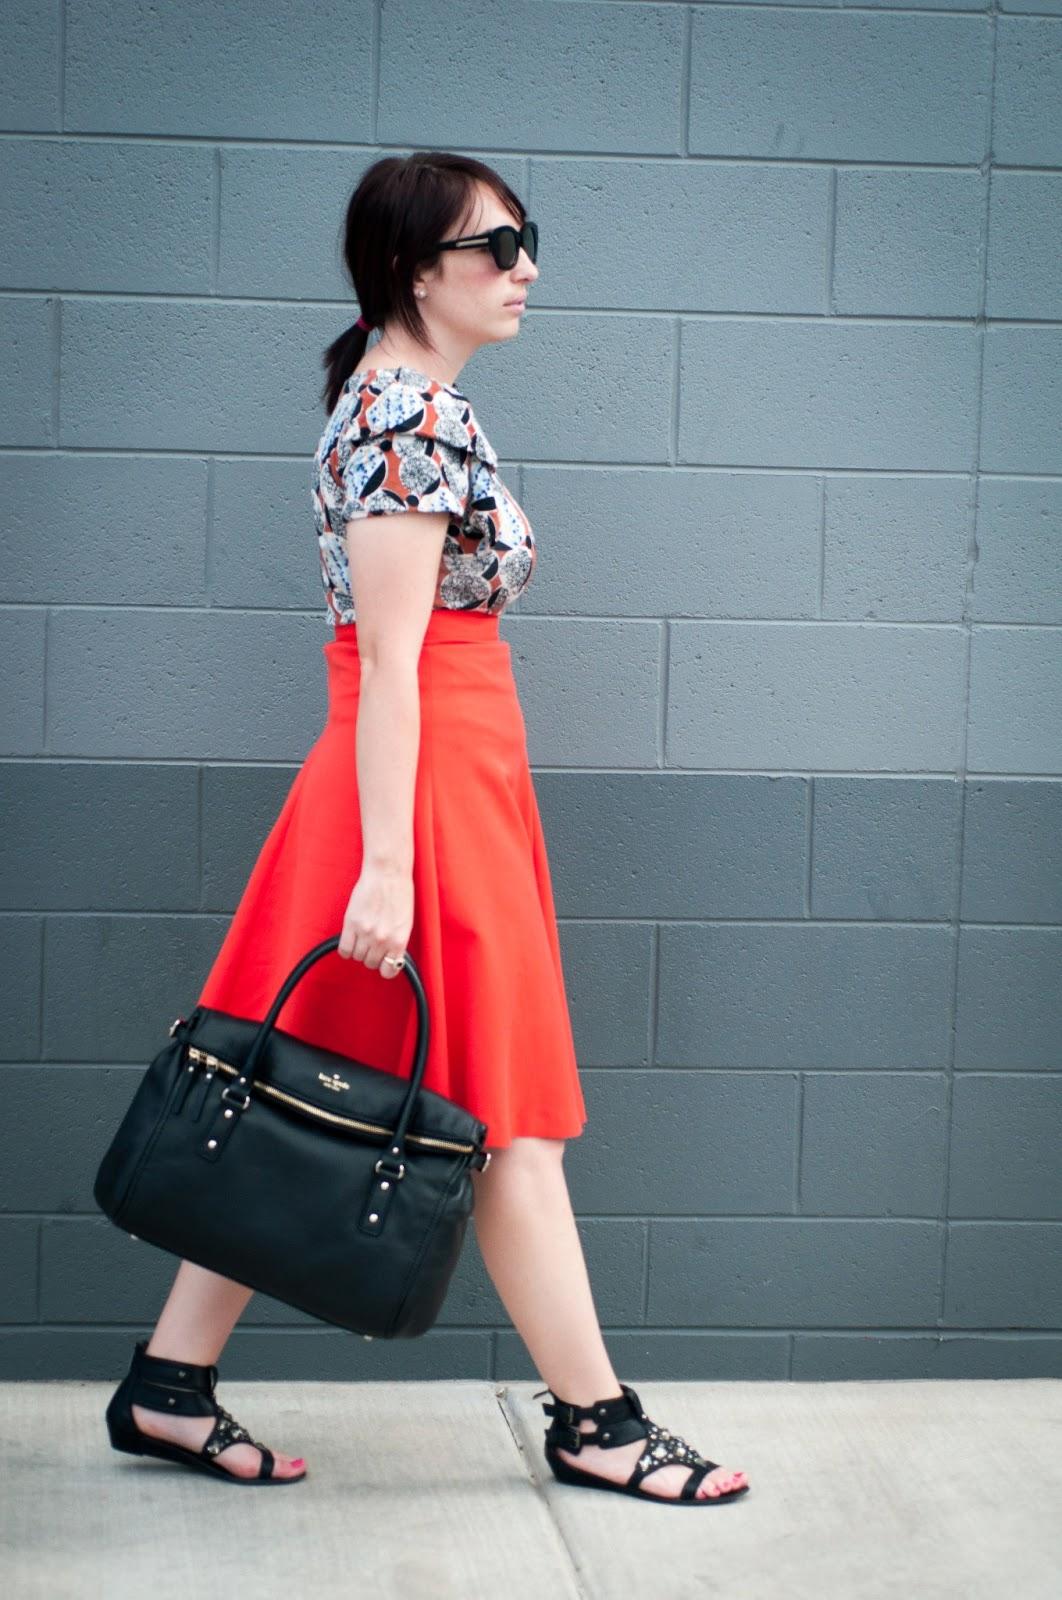 fashion blog, style blog, kate spade new york, h and m, sam edleman, anthropologie, ootd, karen walker